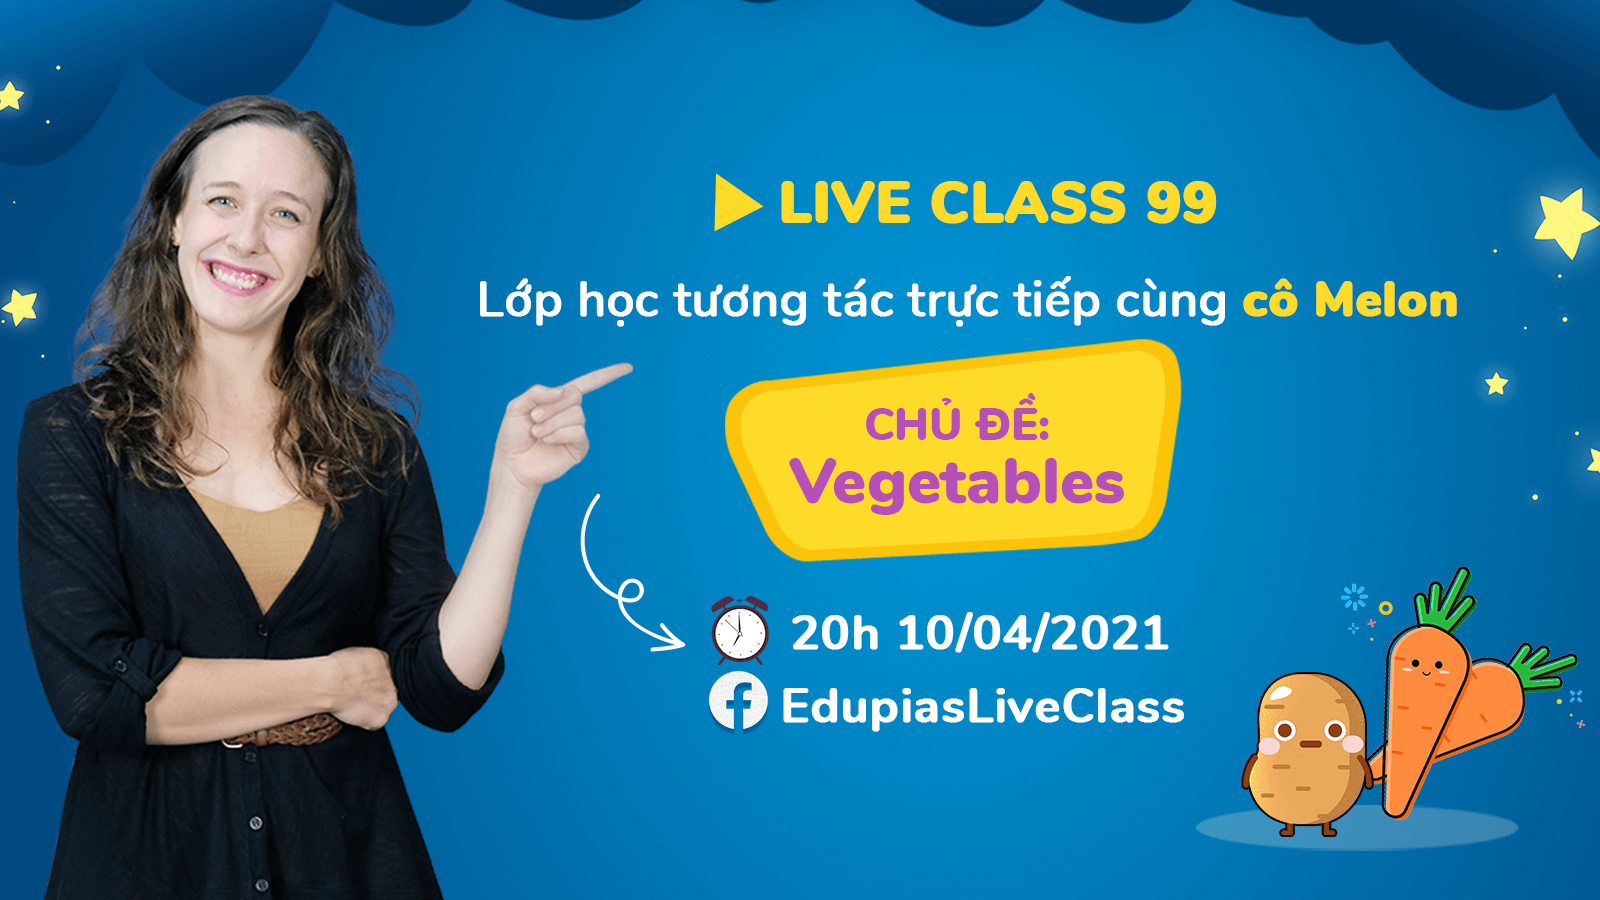 Live class tuần 99 - Chủ đề:  Vegetables